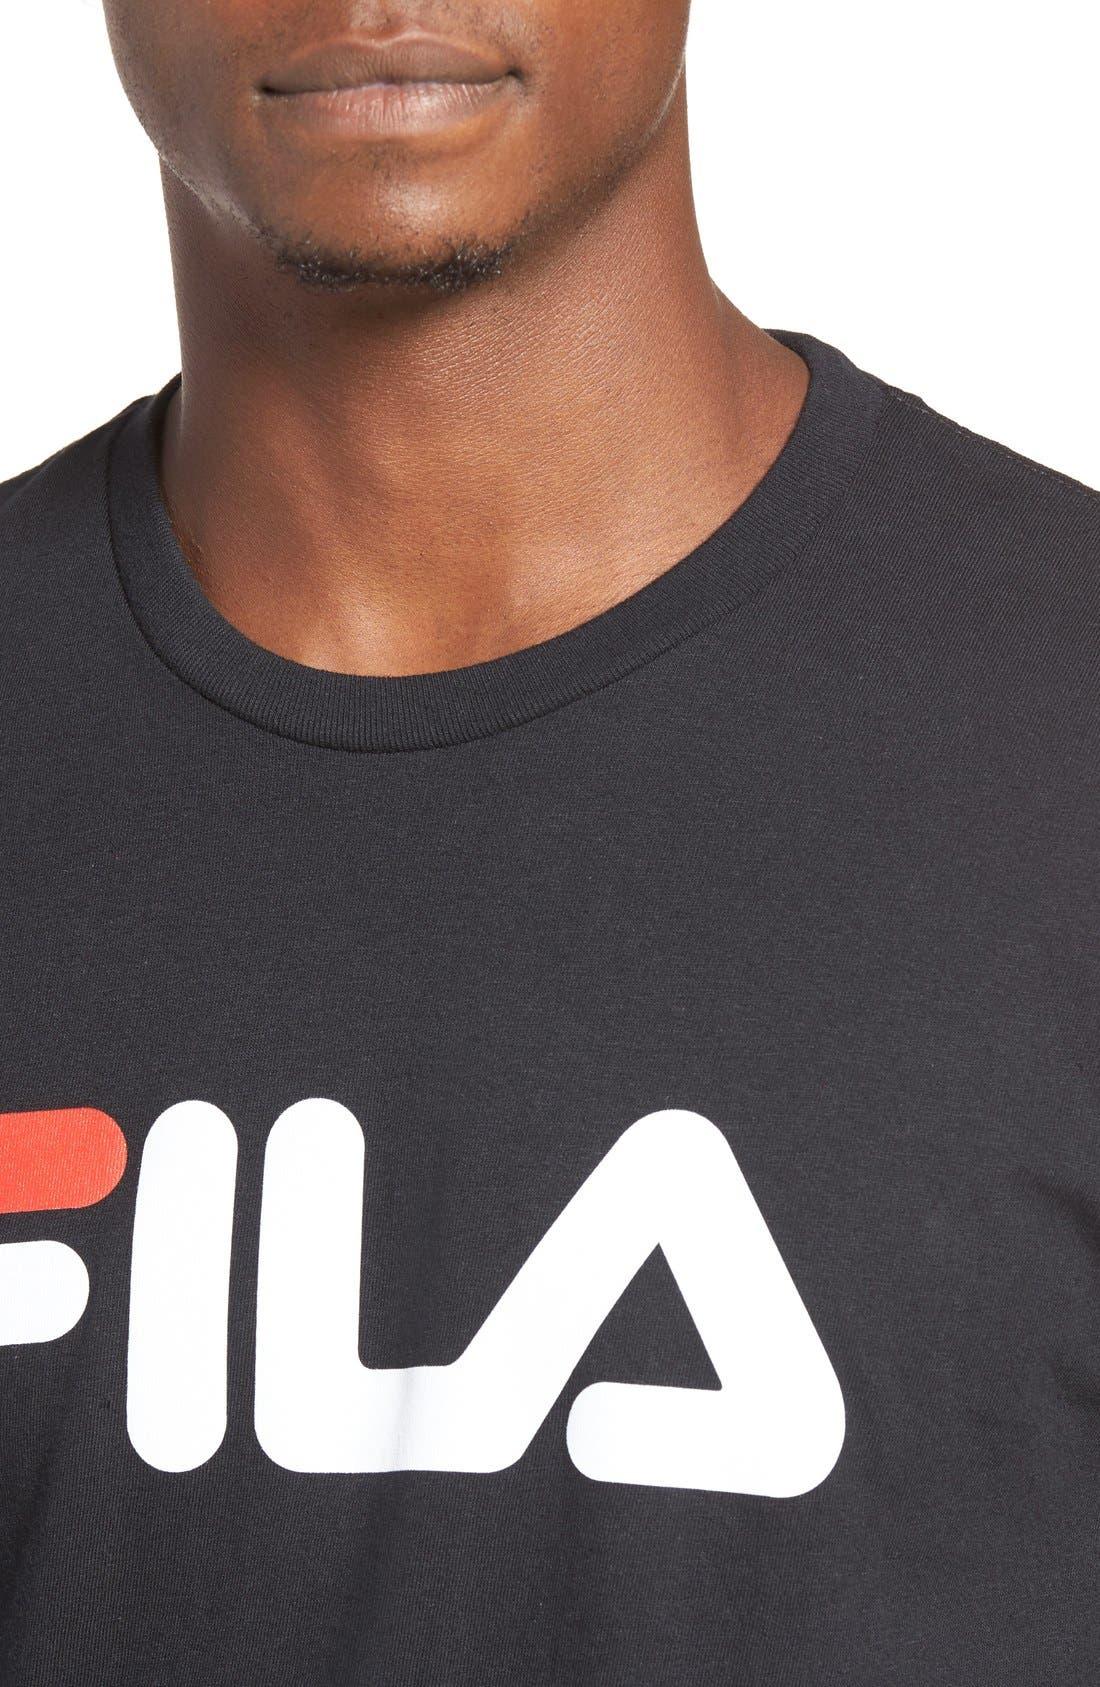 USA Graphic T-Shirt,                             Alternate thumbnail 4, color,                             Black